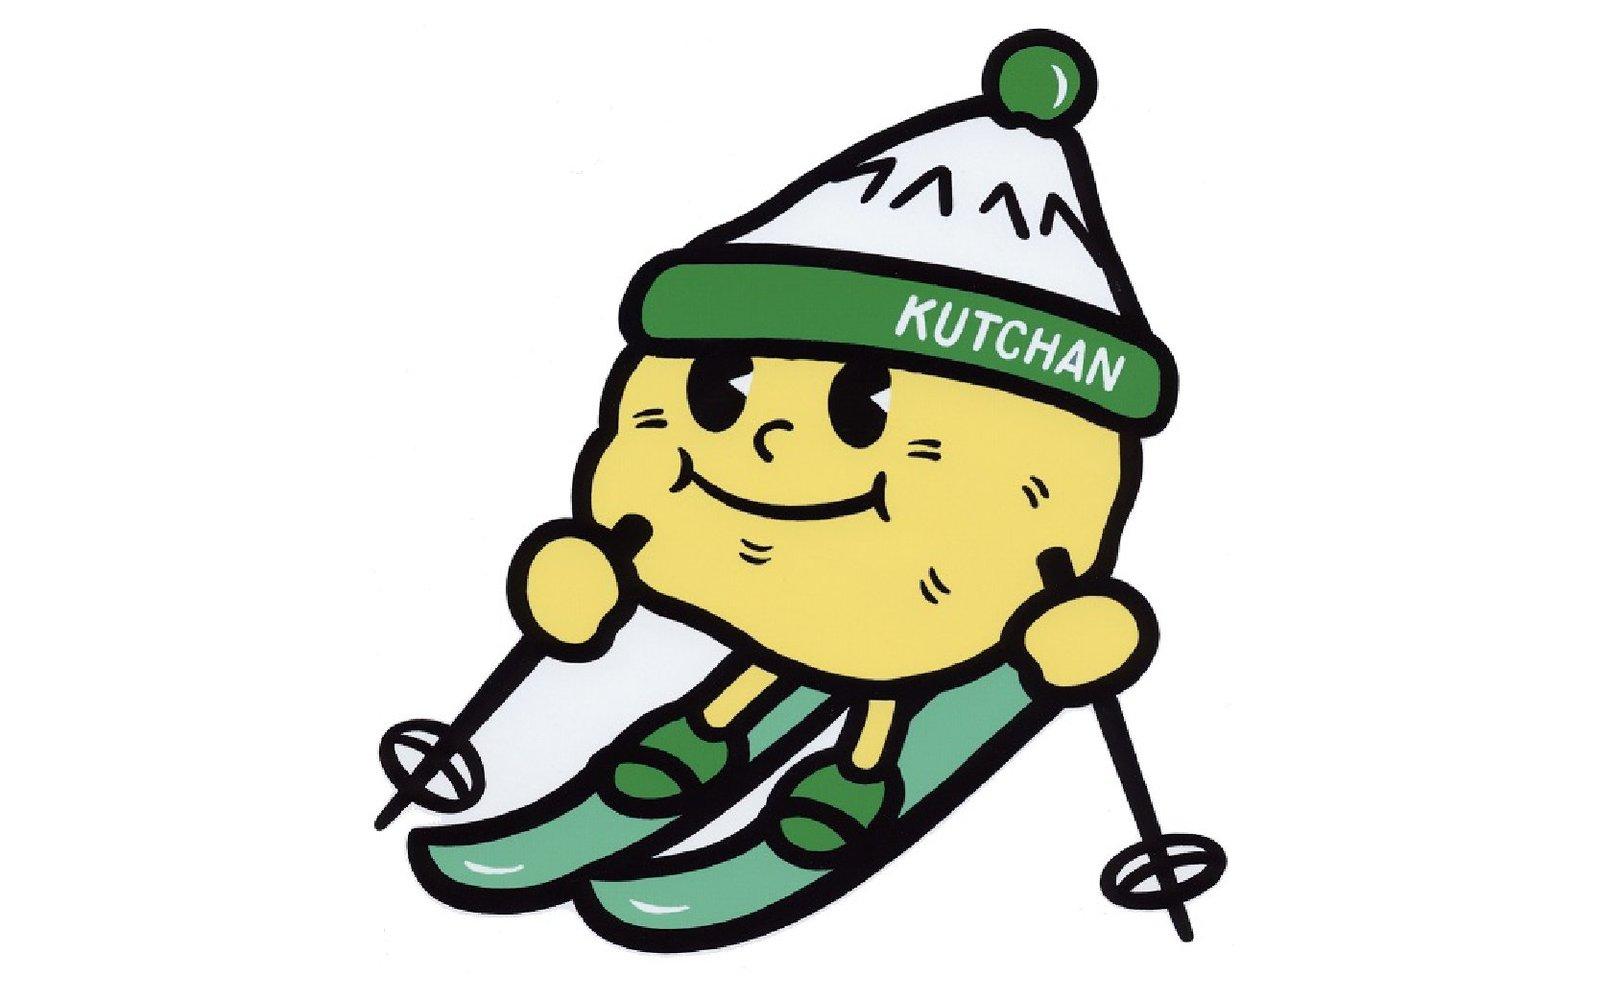 Kutchan town mascot Jagata-kun じゃがたくん